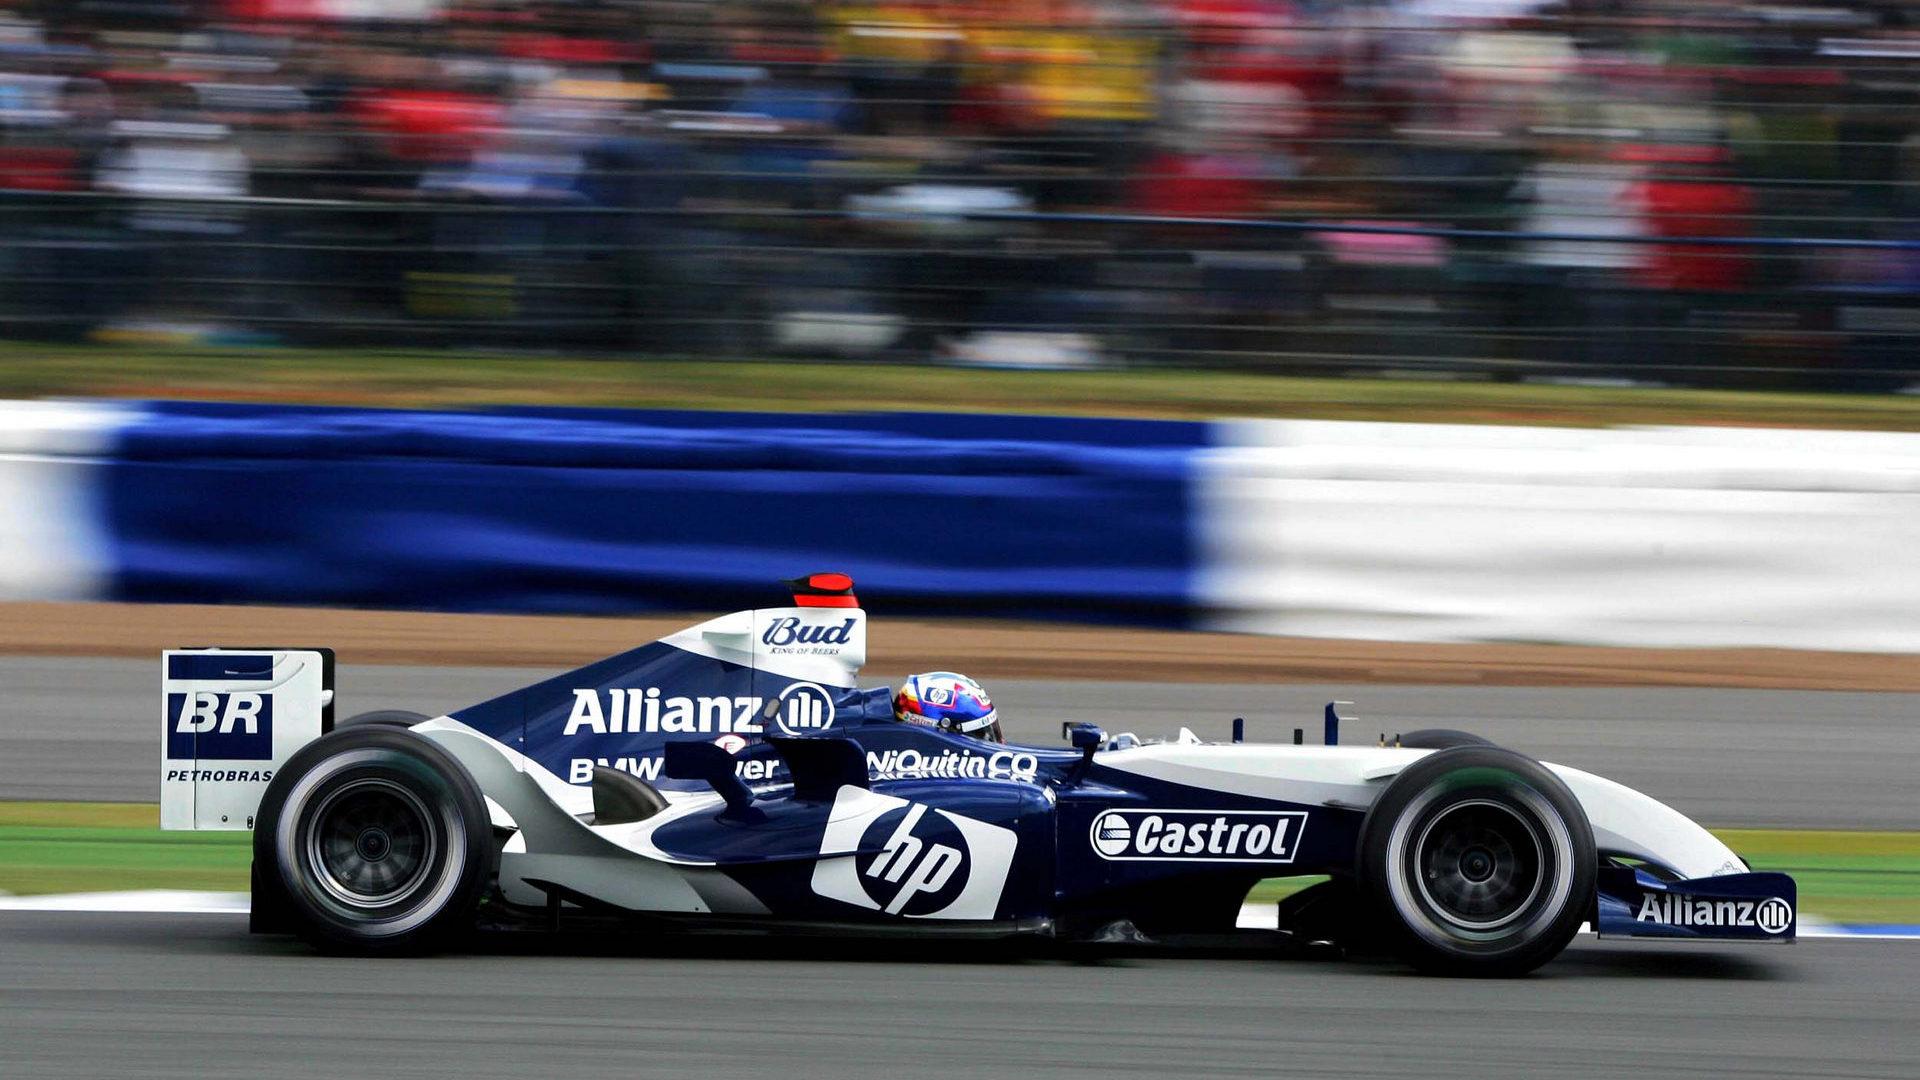 Formula 1 hotel room pictures 11